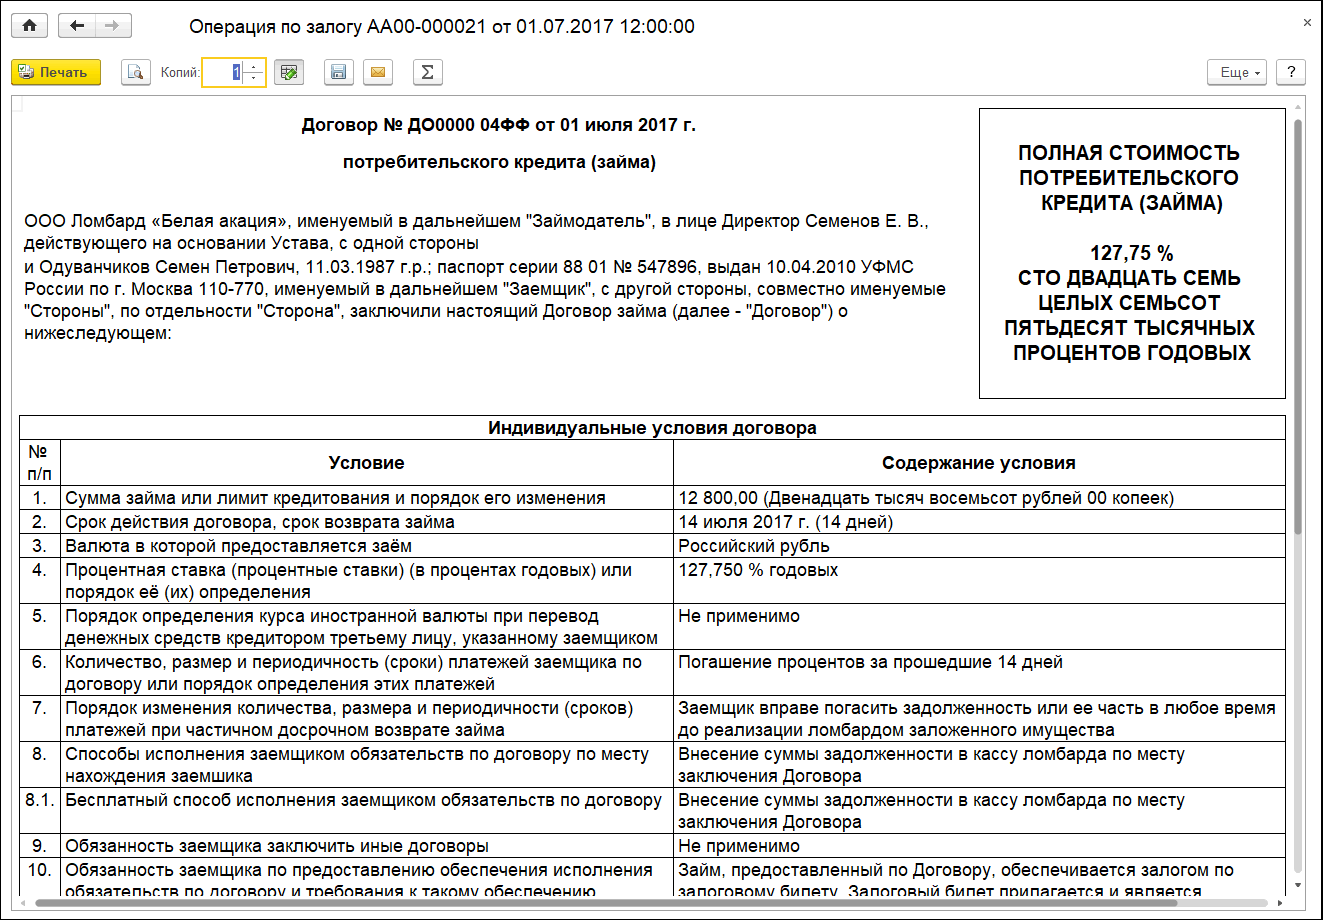 крым кредиты украинским банкам